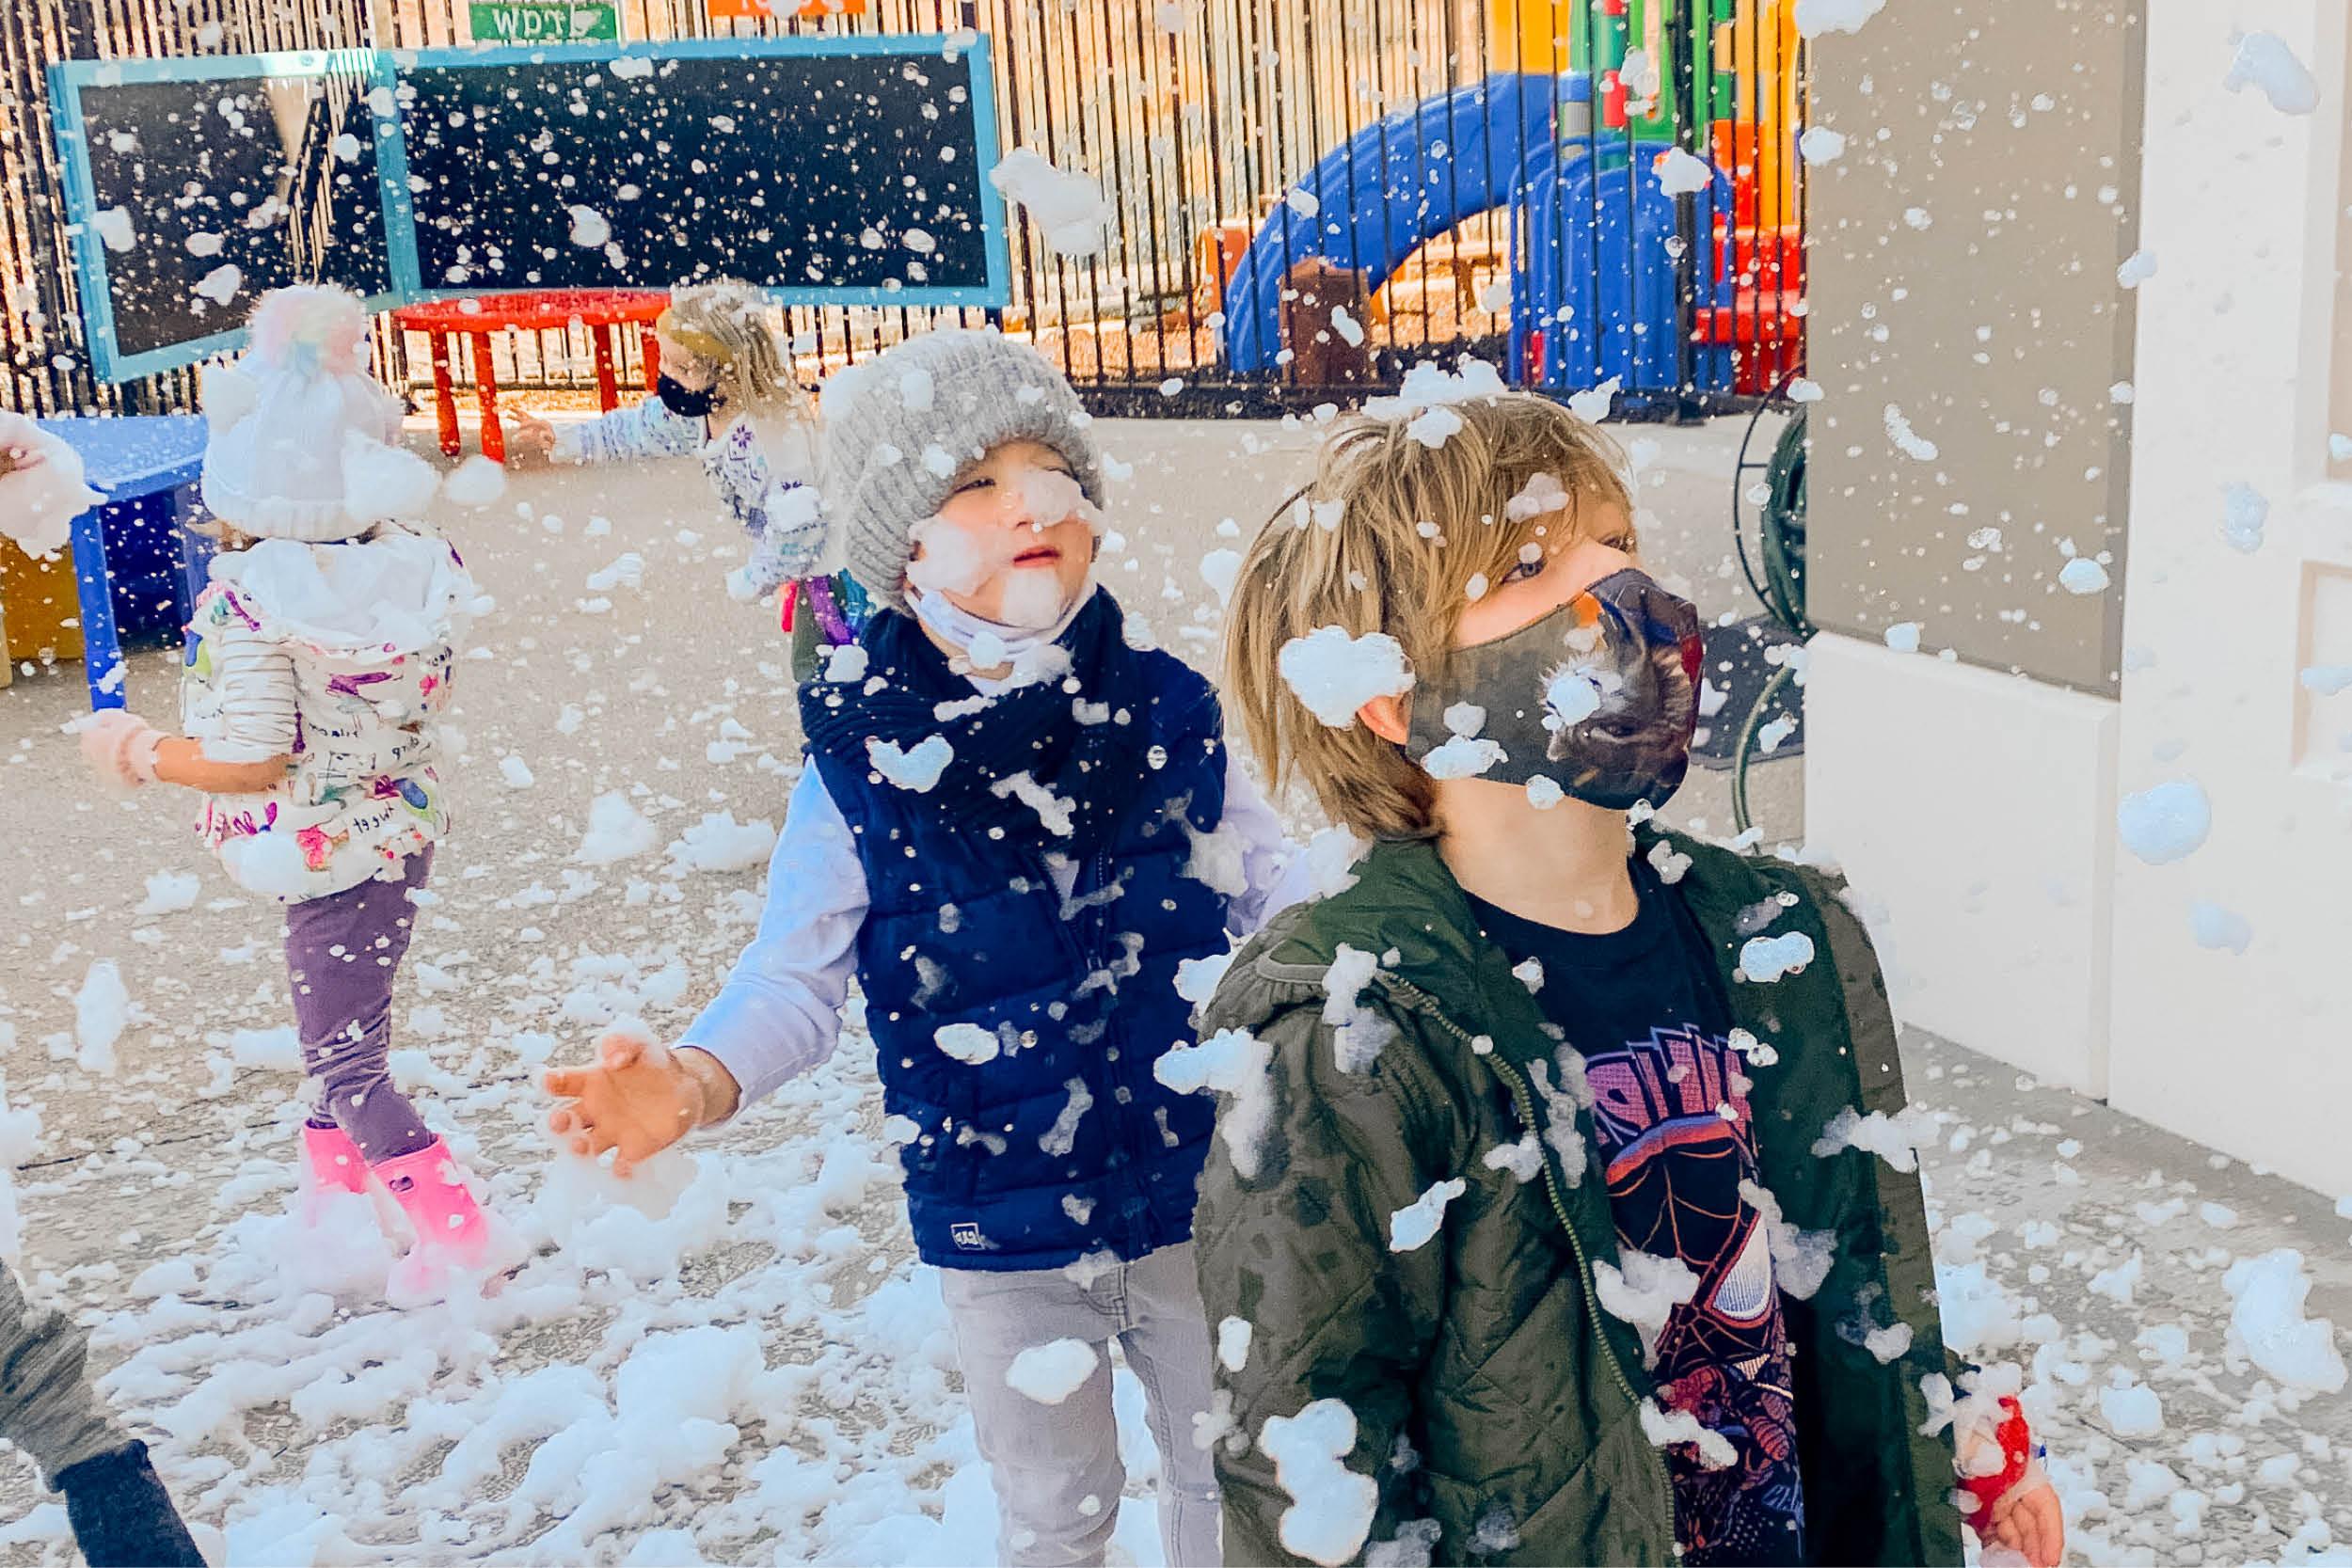 Fairmont Schools - Incorporate Fun Learning Opportunities into Your Winter Break